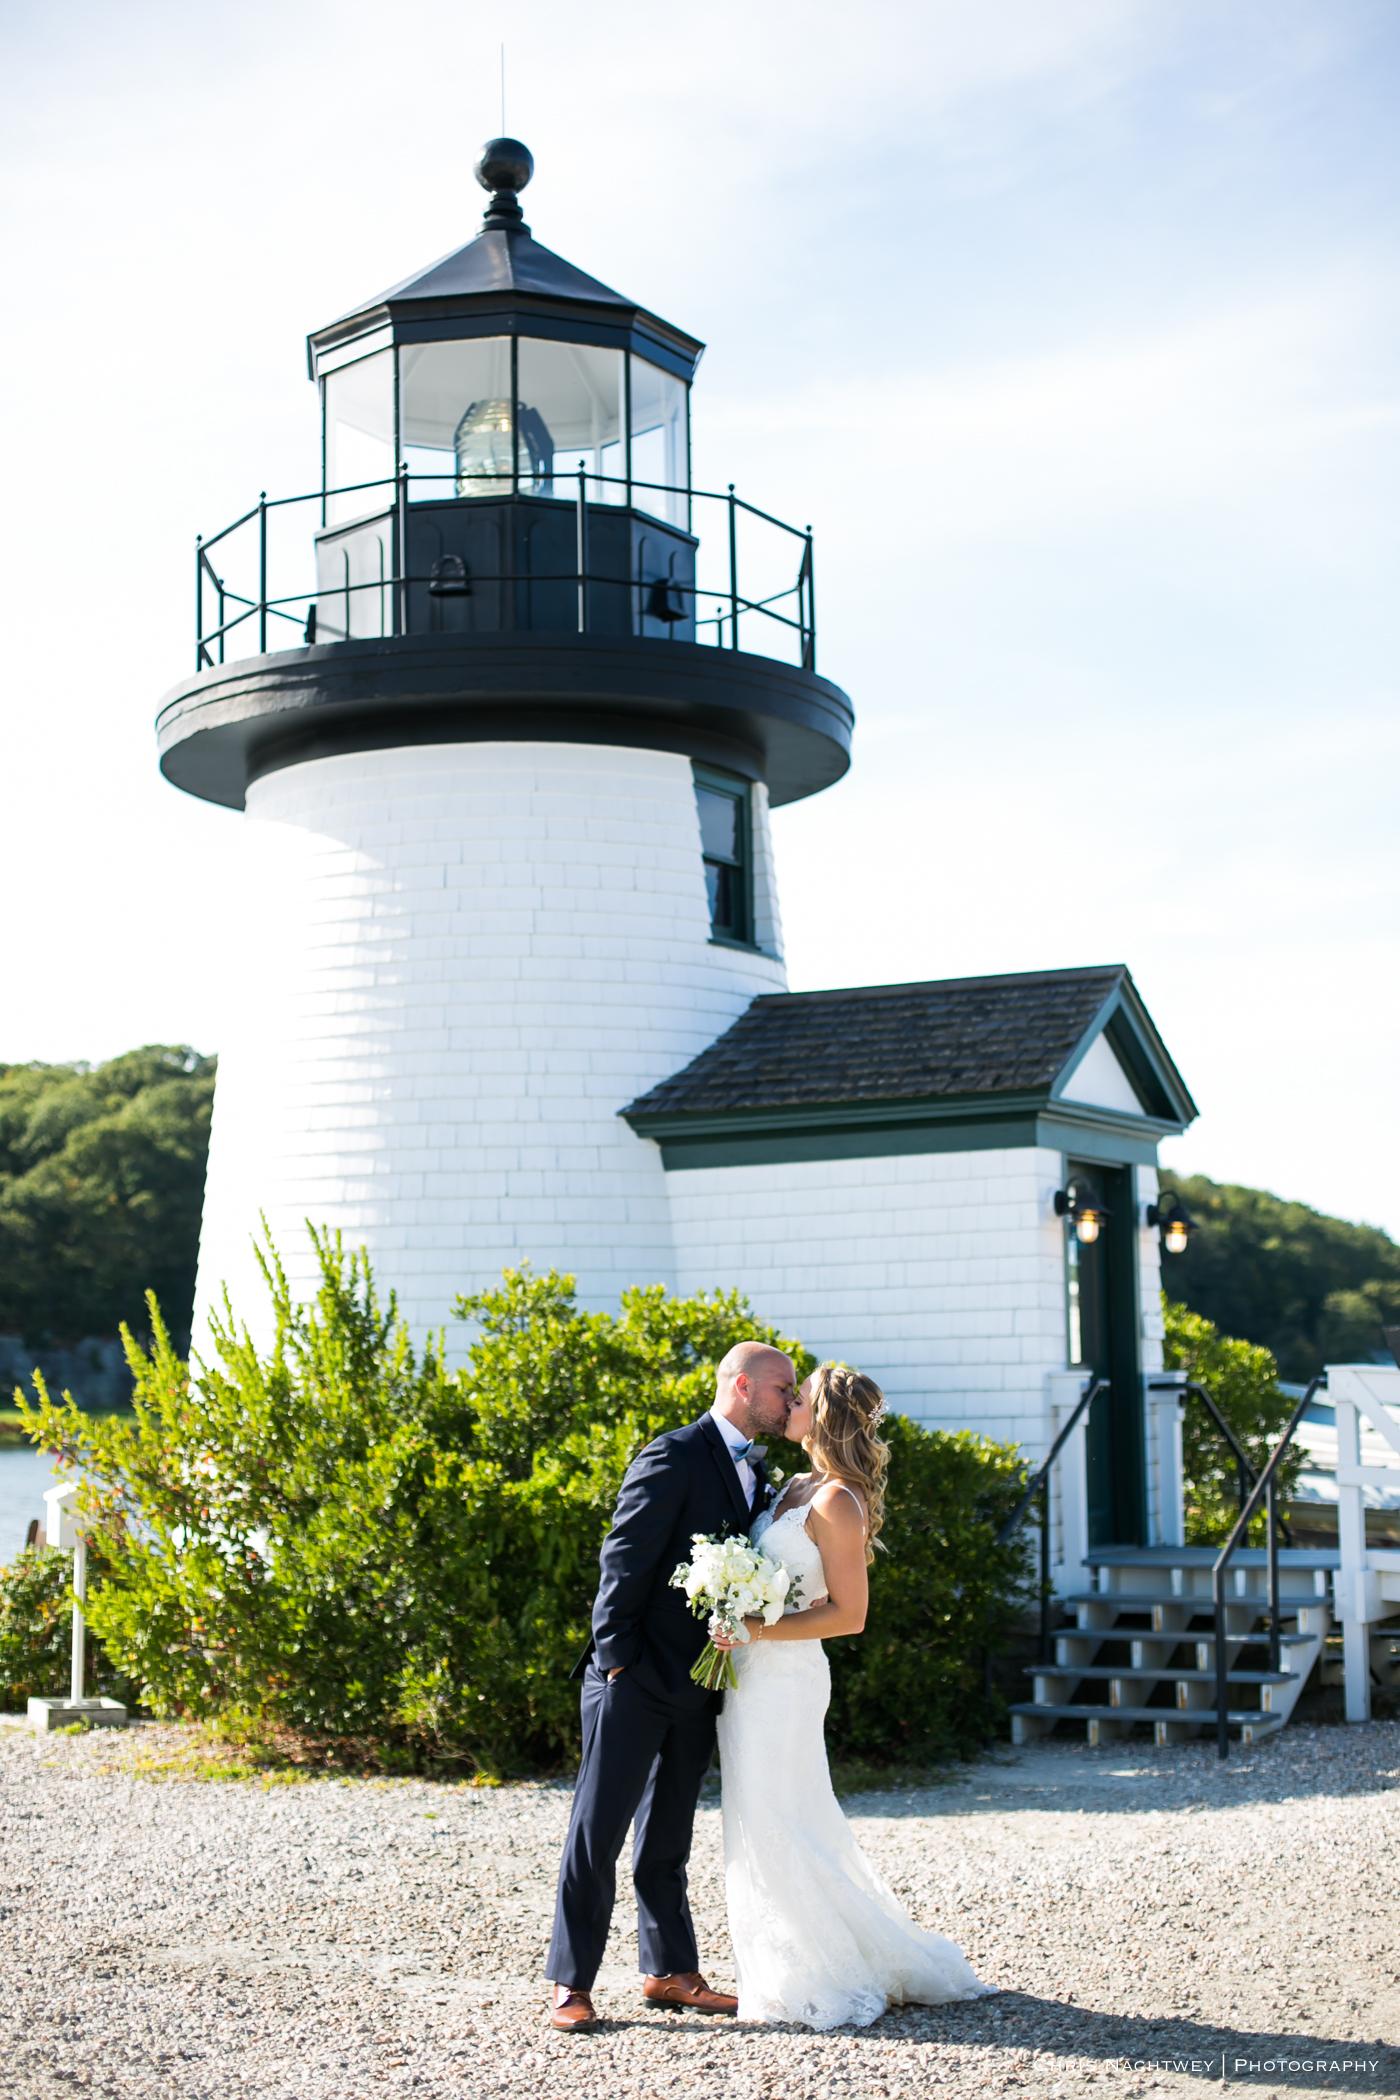 mystic-ct-artistic-wedding-photographers-chris-nachtwey-tany-mike-2017-16.jpg